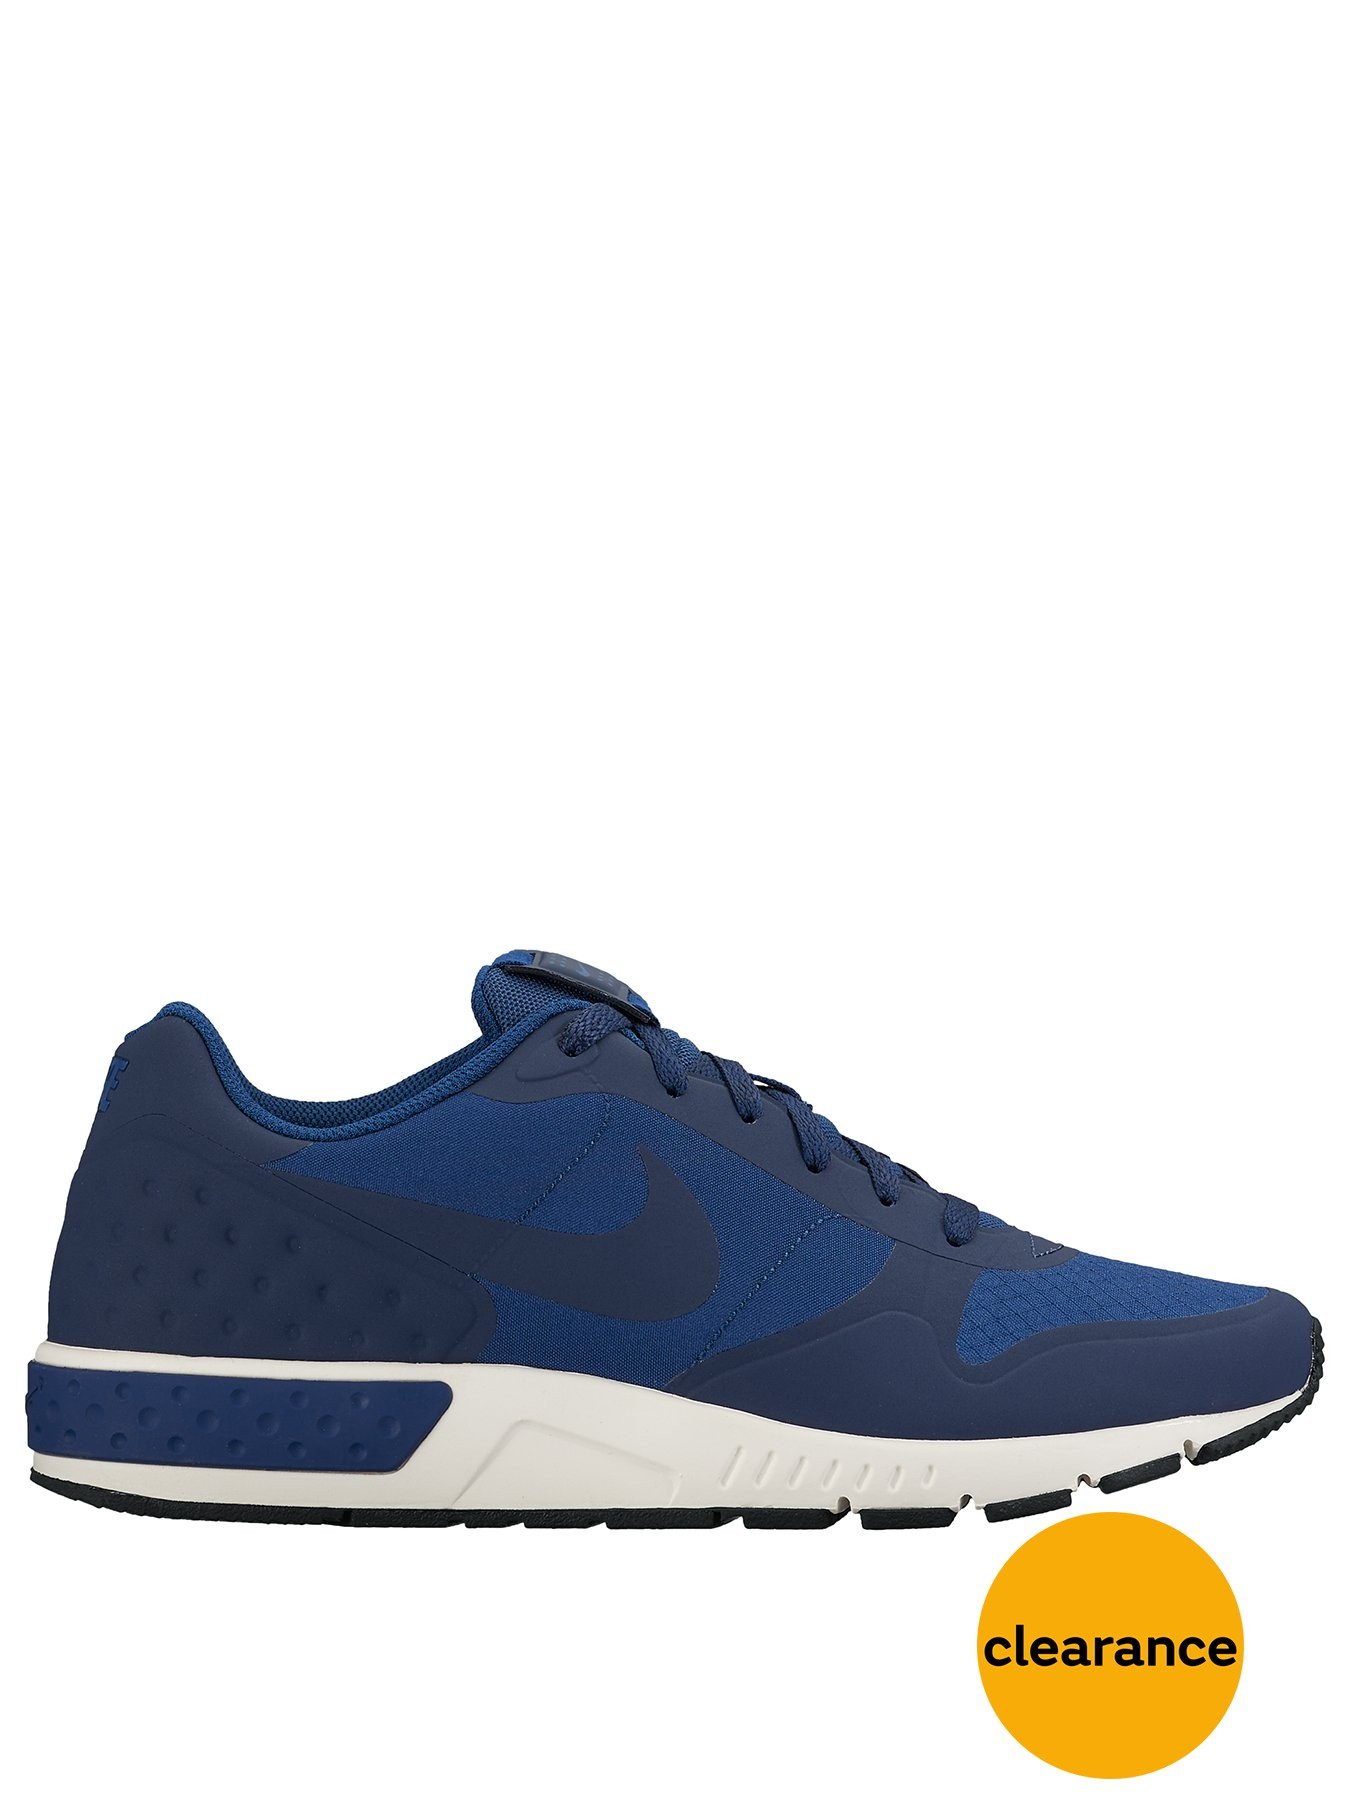 Nike Nightgazer LW 1600074860 Men's Shoes Nike Trainers